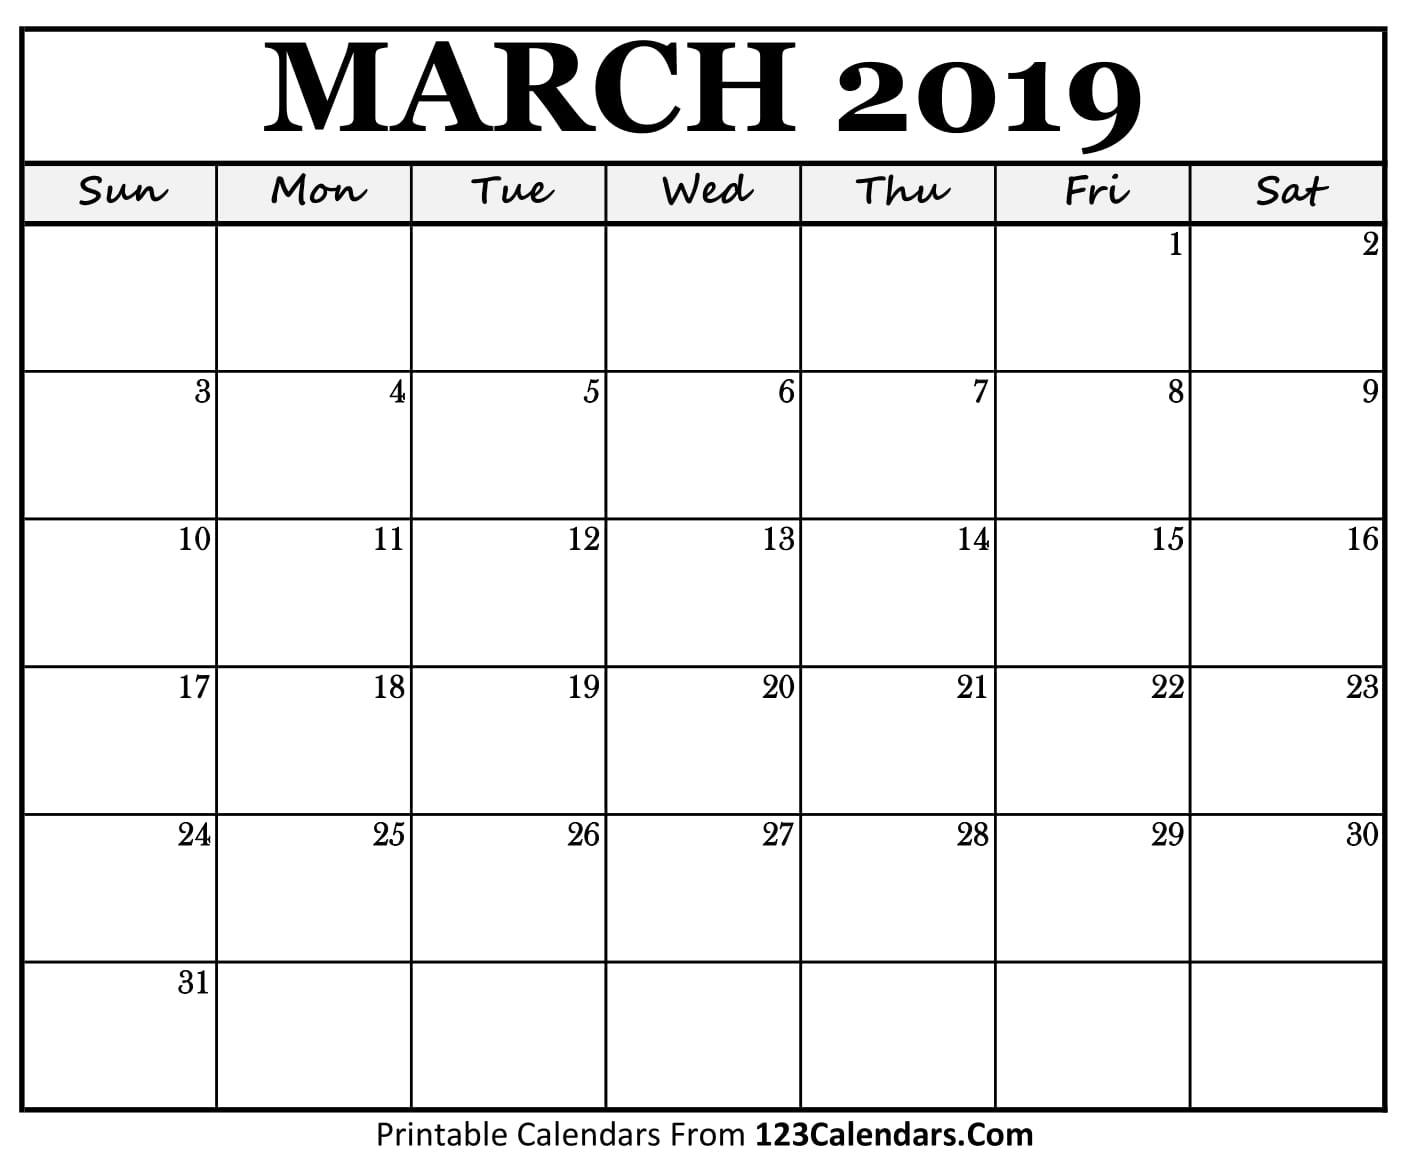 March 2019 Calendar Blank Easily Printable 123calendars